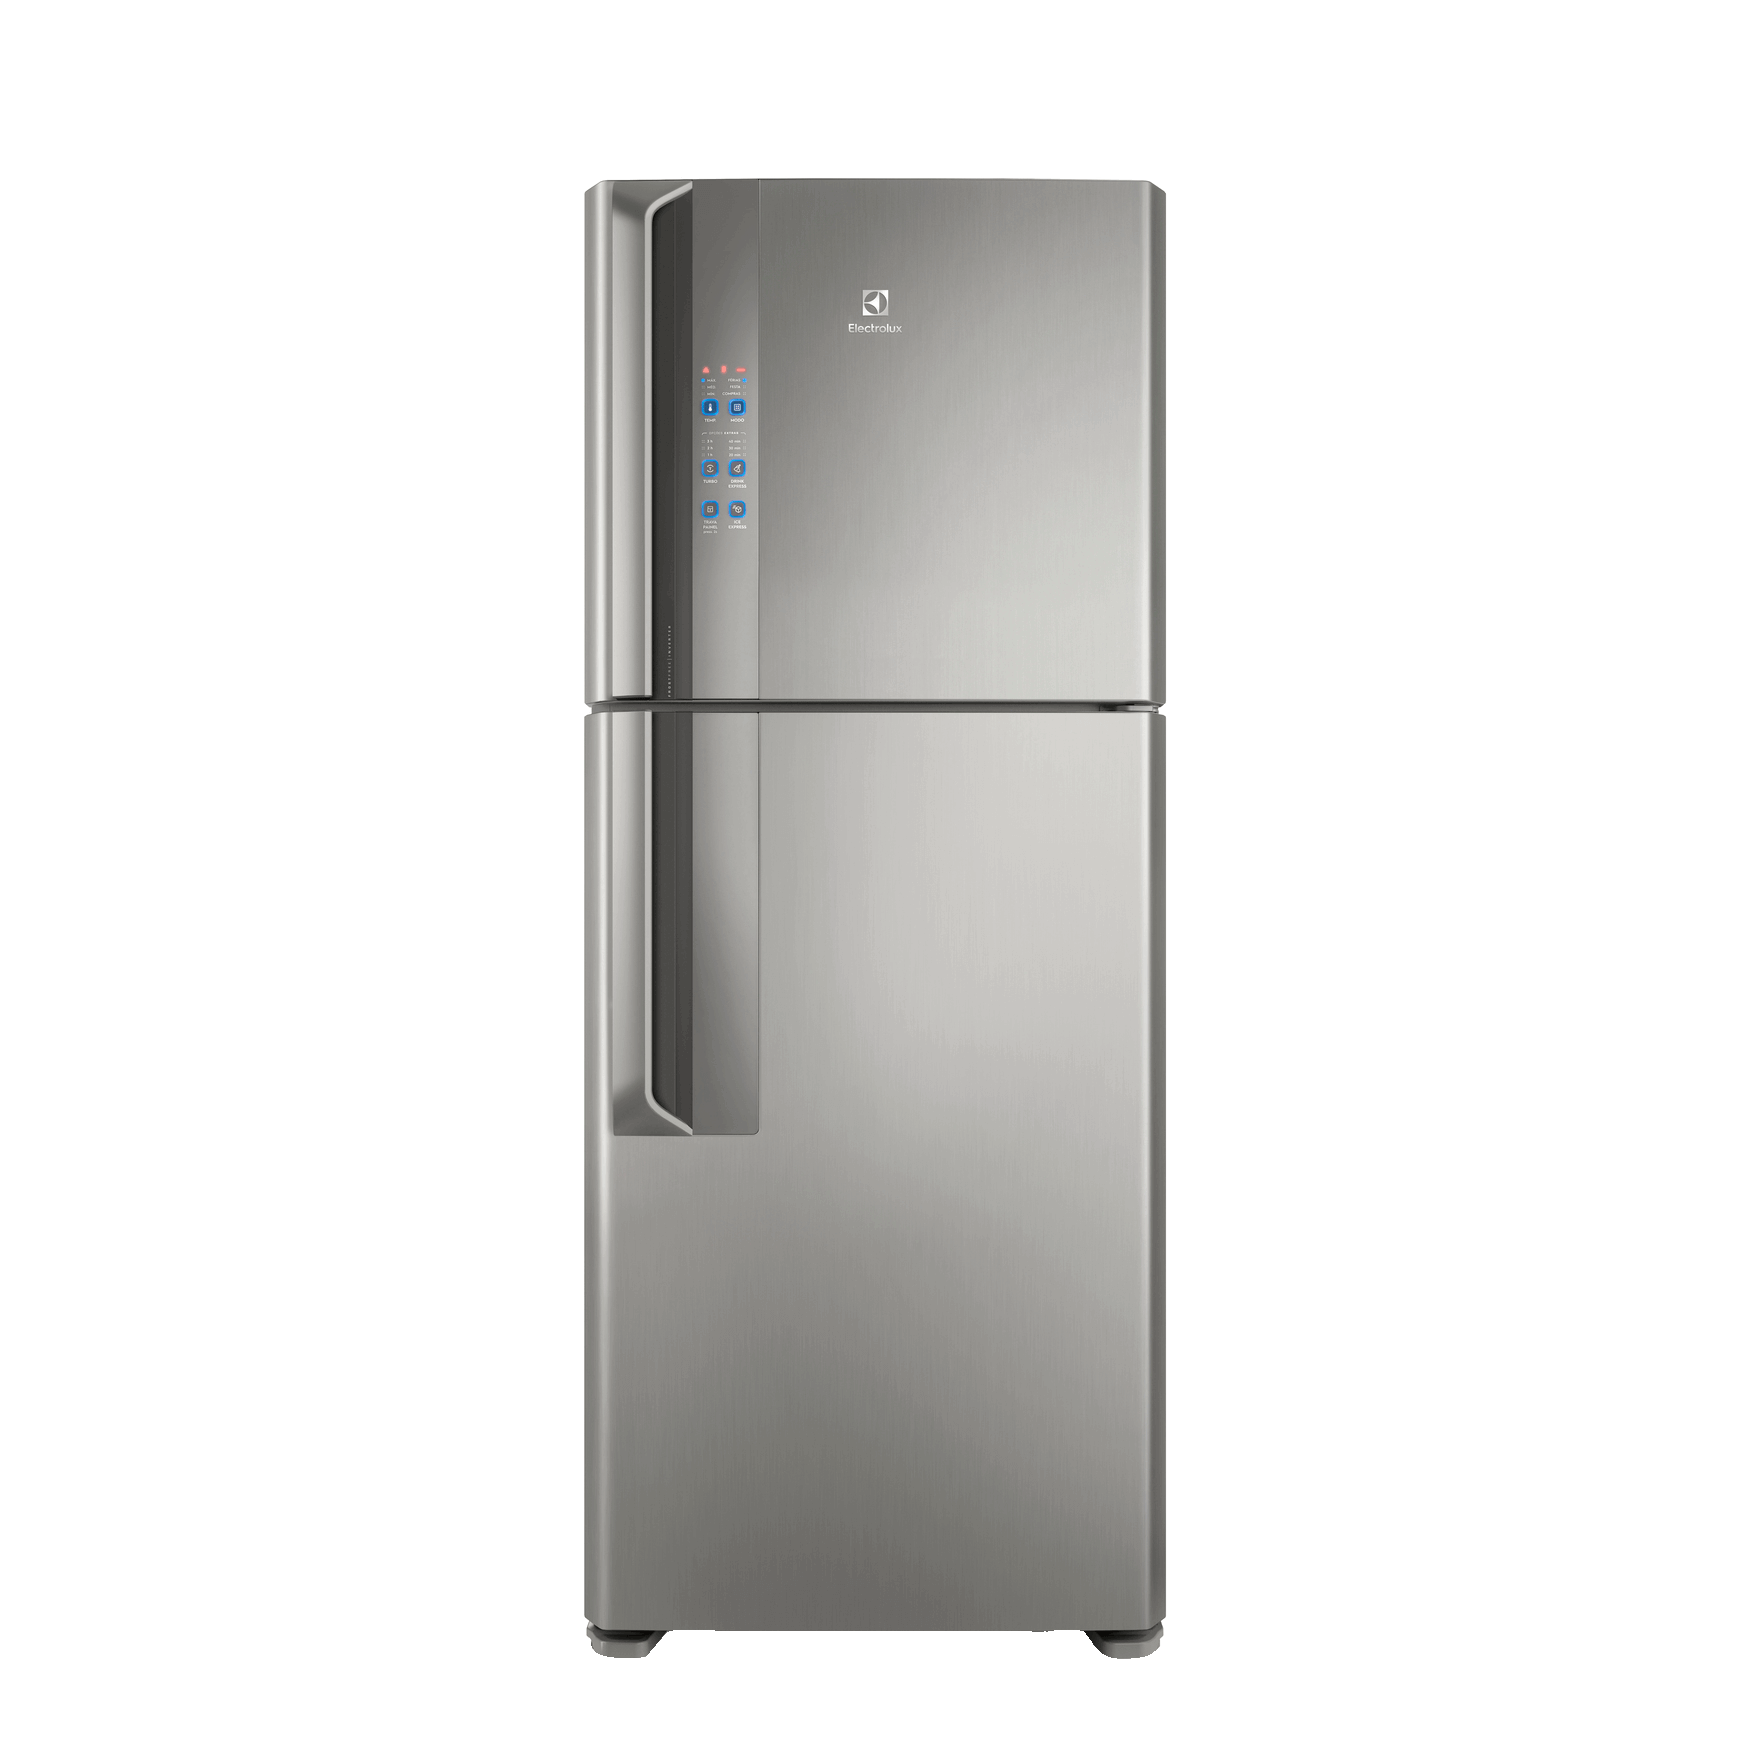 Geladeira/Refrigerador Inverter Top Freezer 431L Platinum (IF55S).